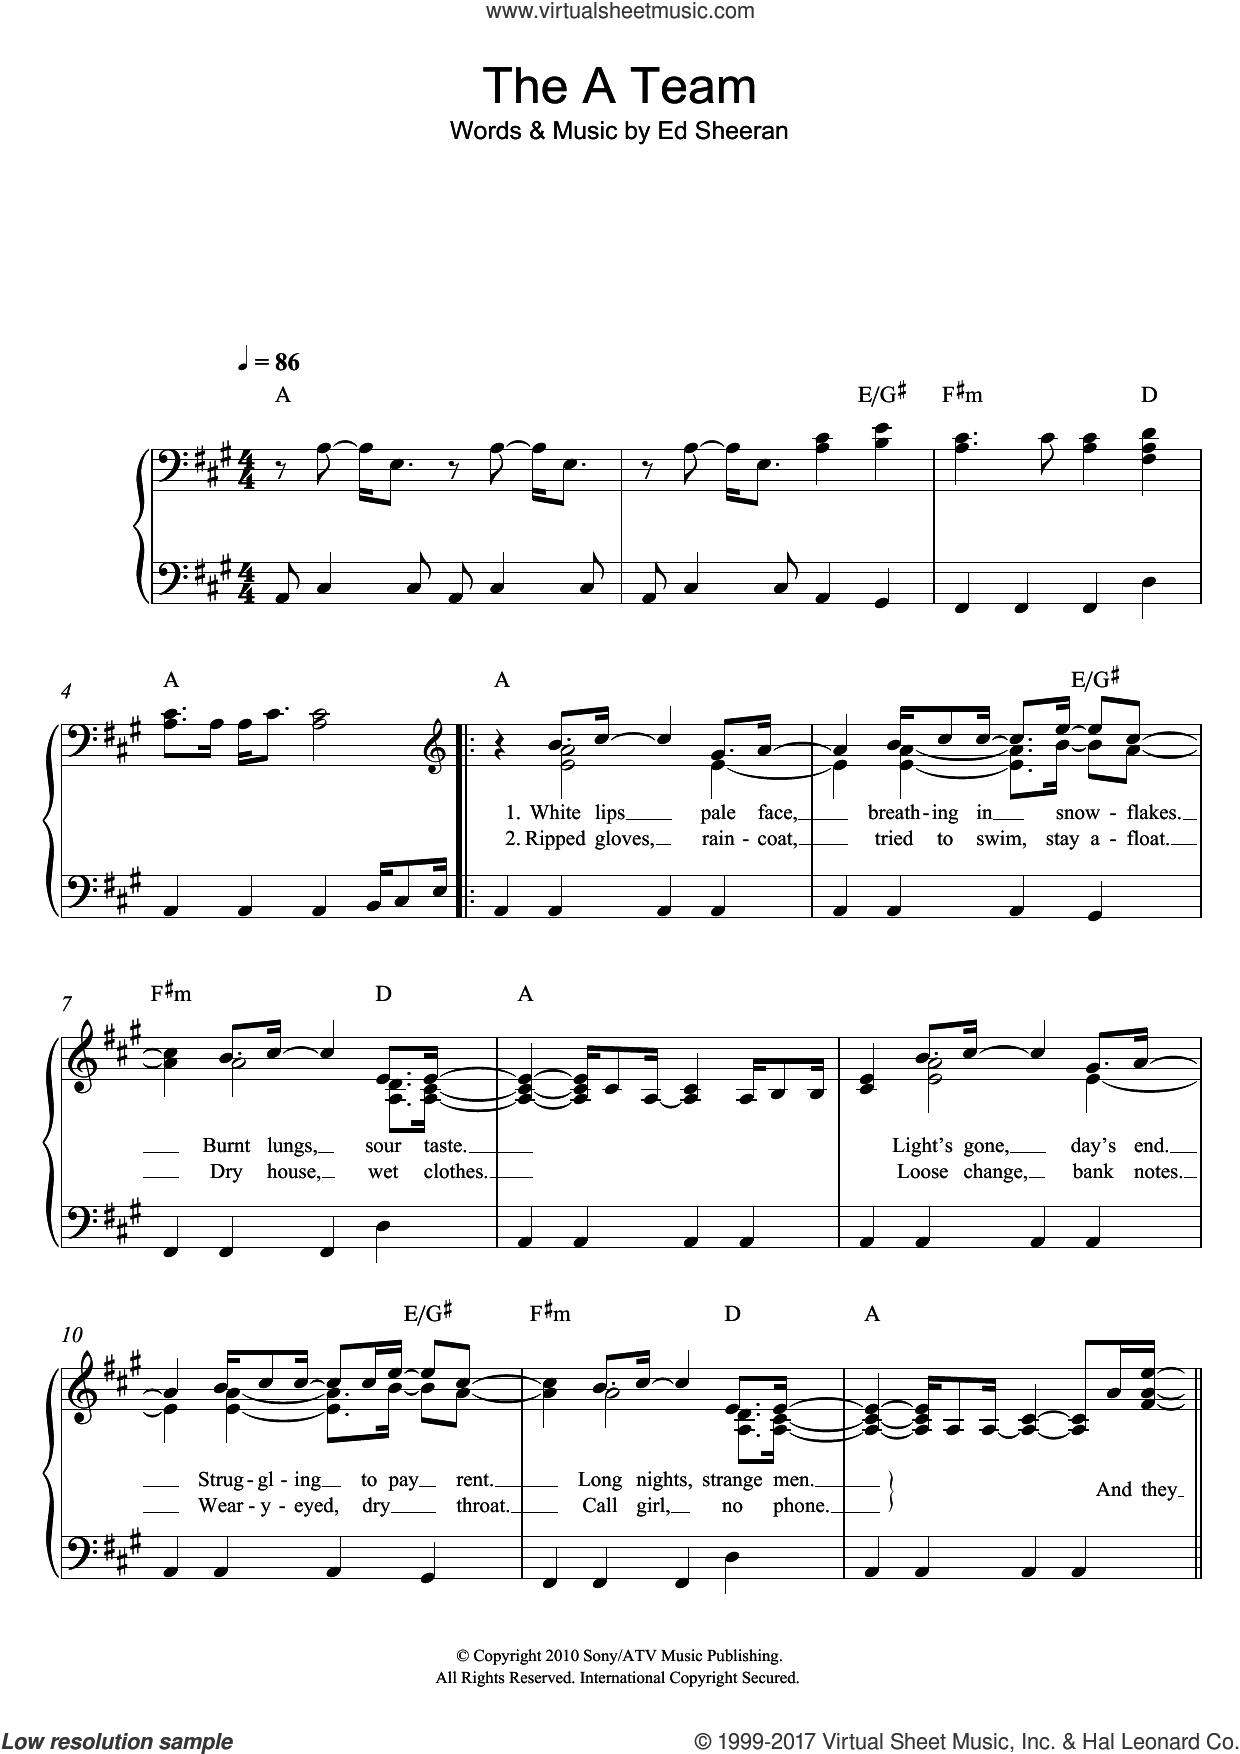 Sheeran   The A Team sheet music for piano solo [PDF] v15